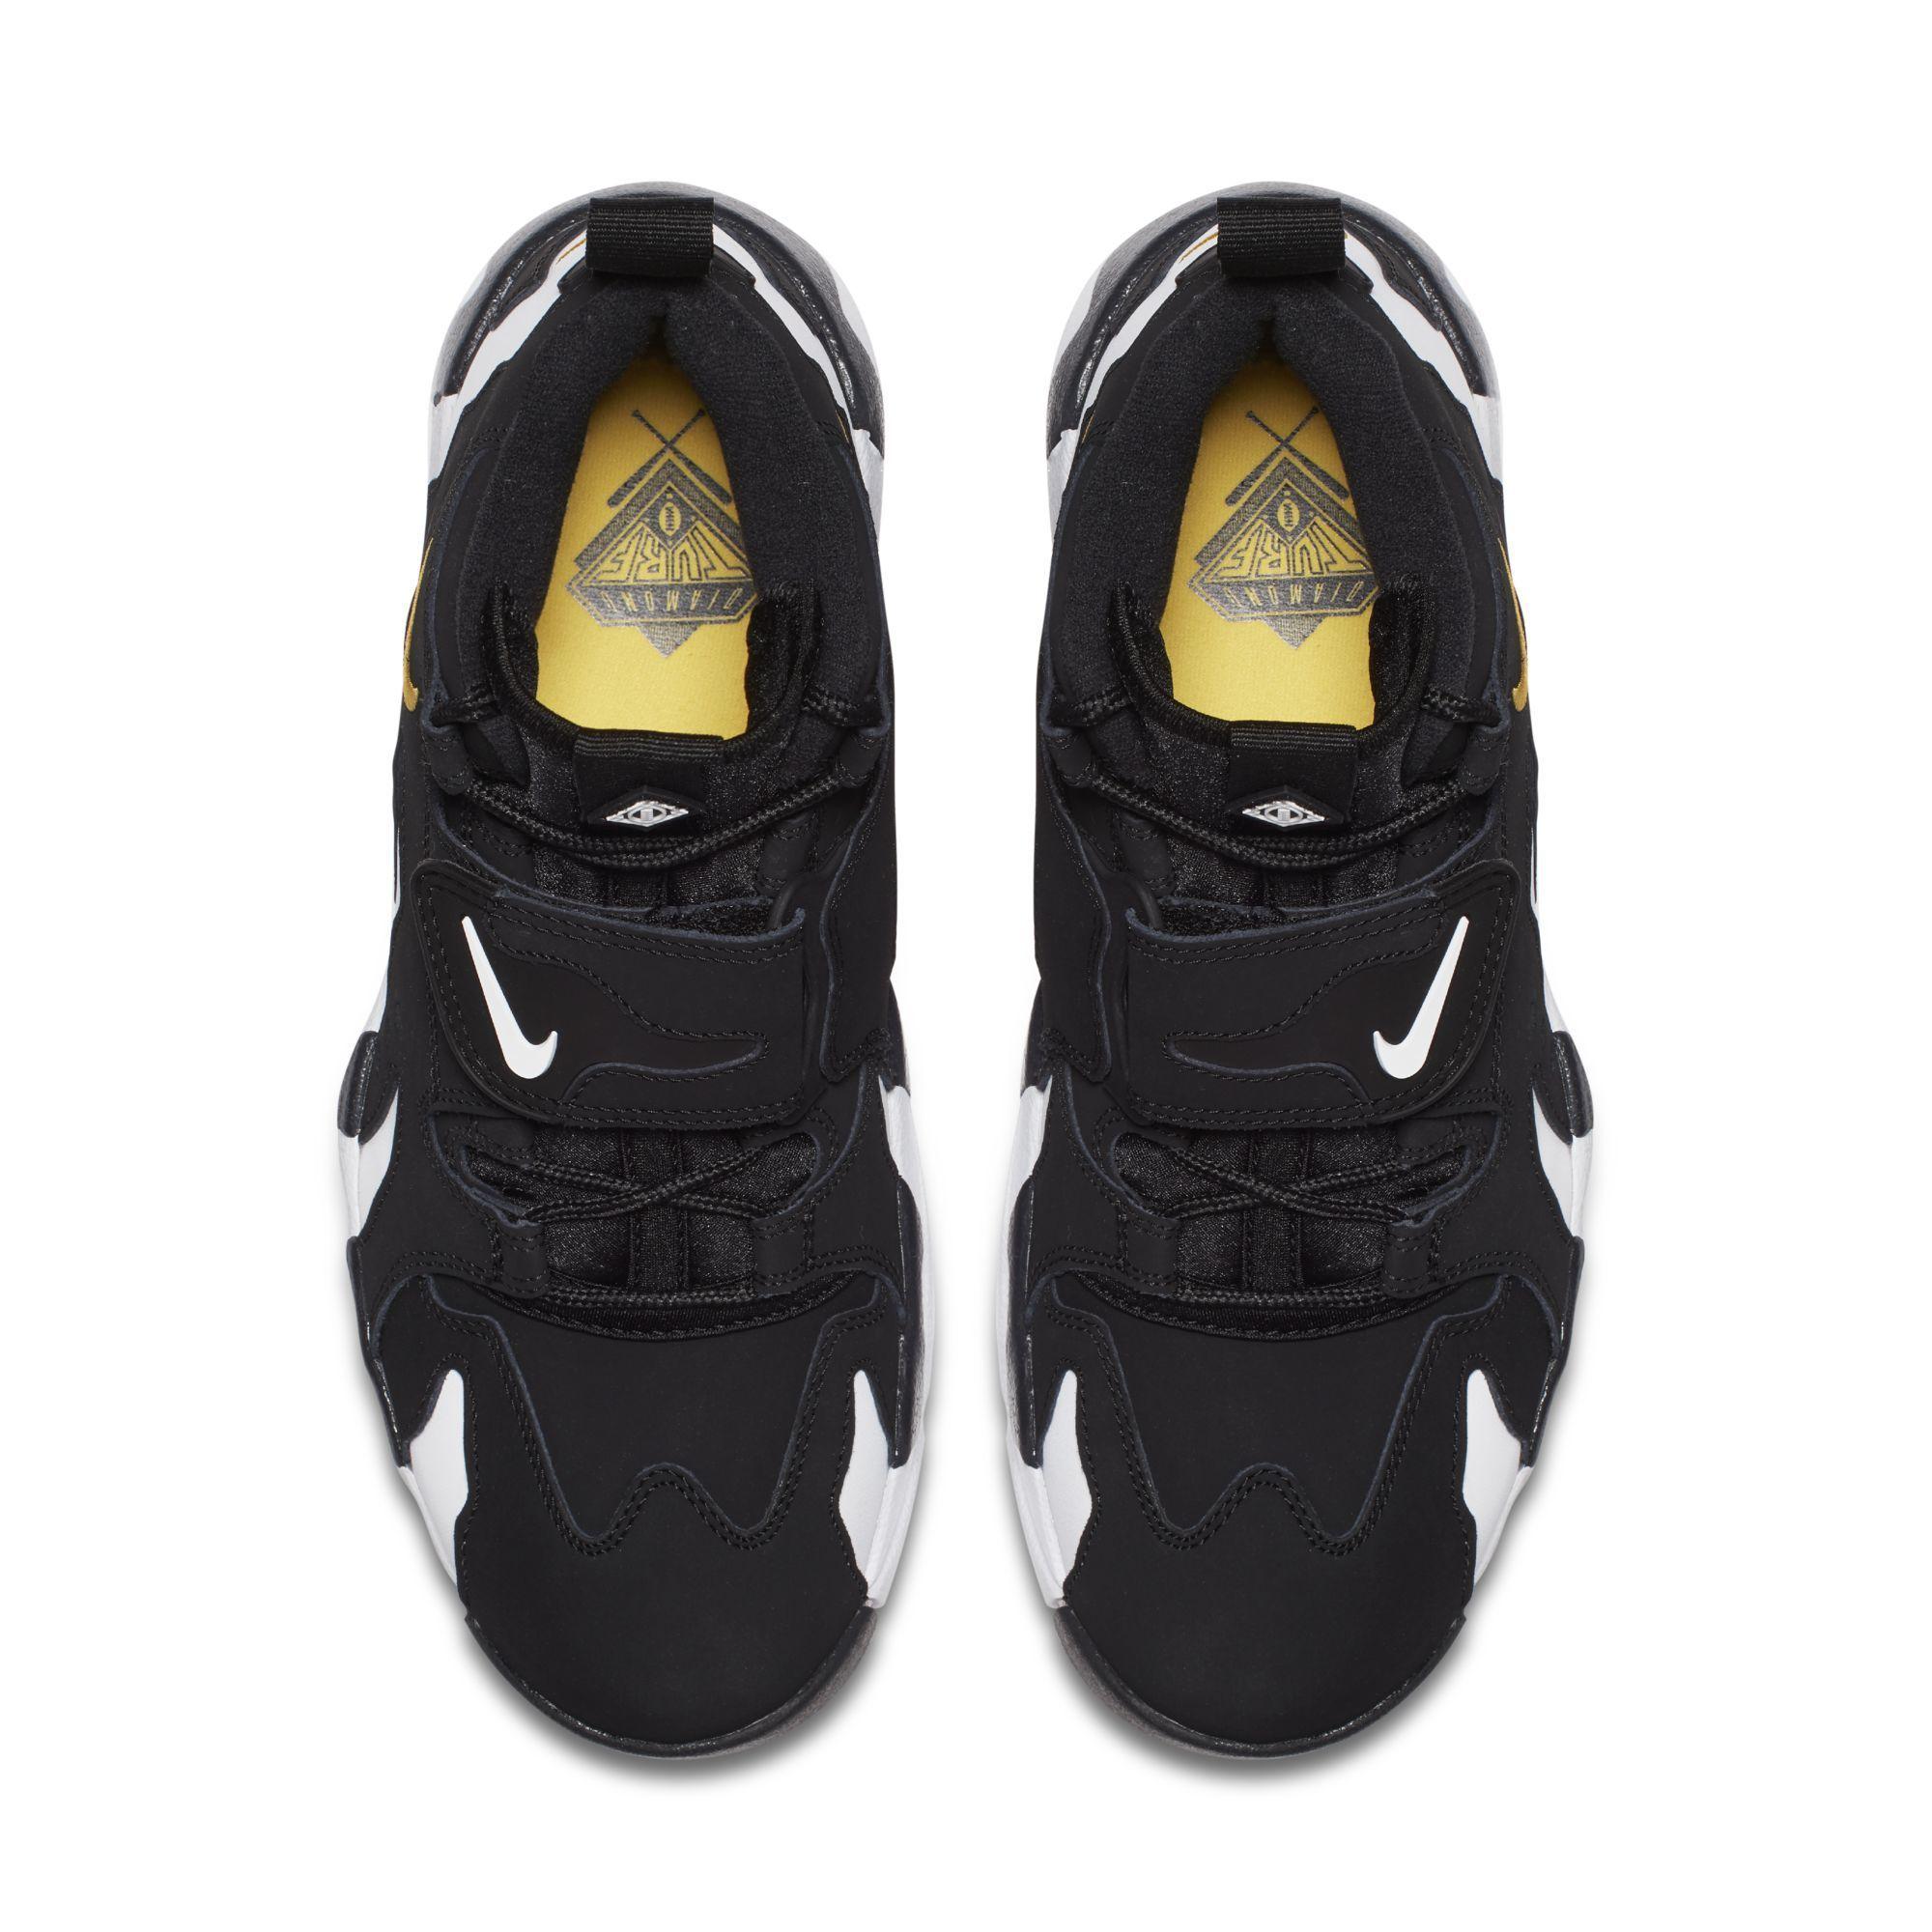 Nike Air Dt Max 96 2